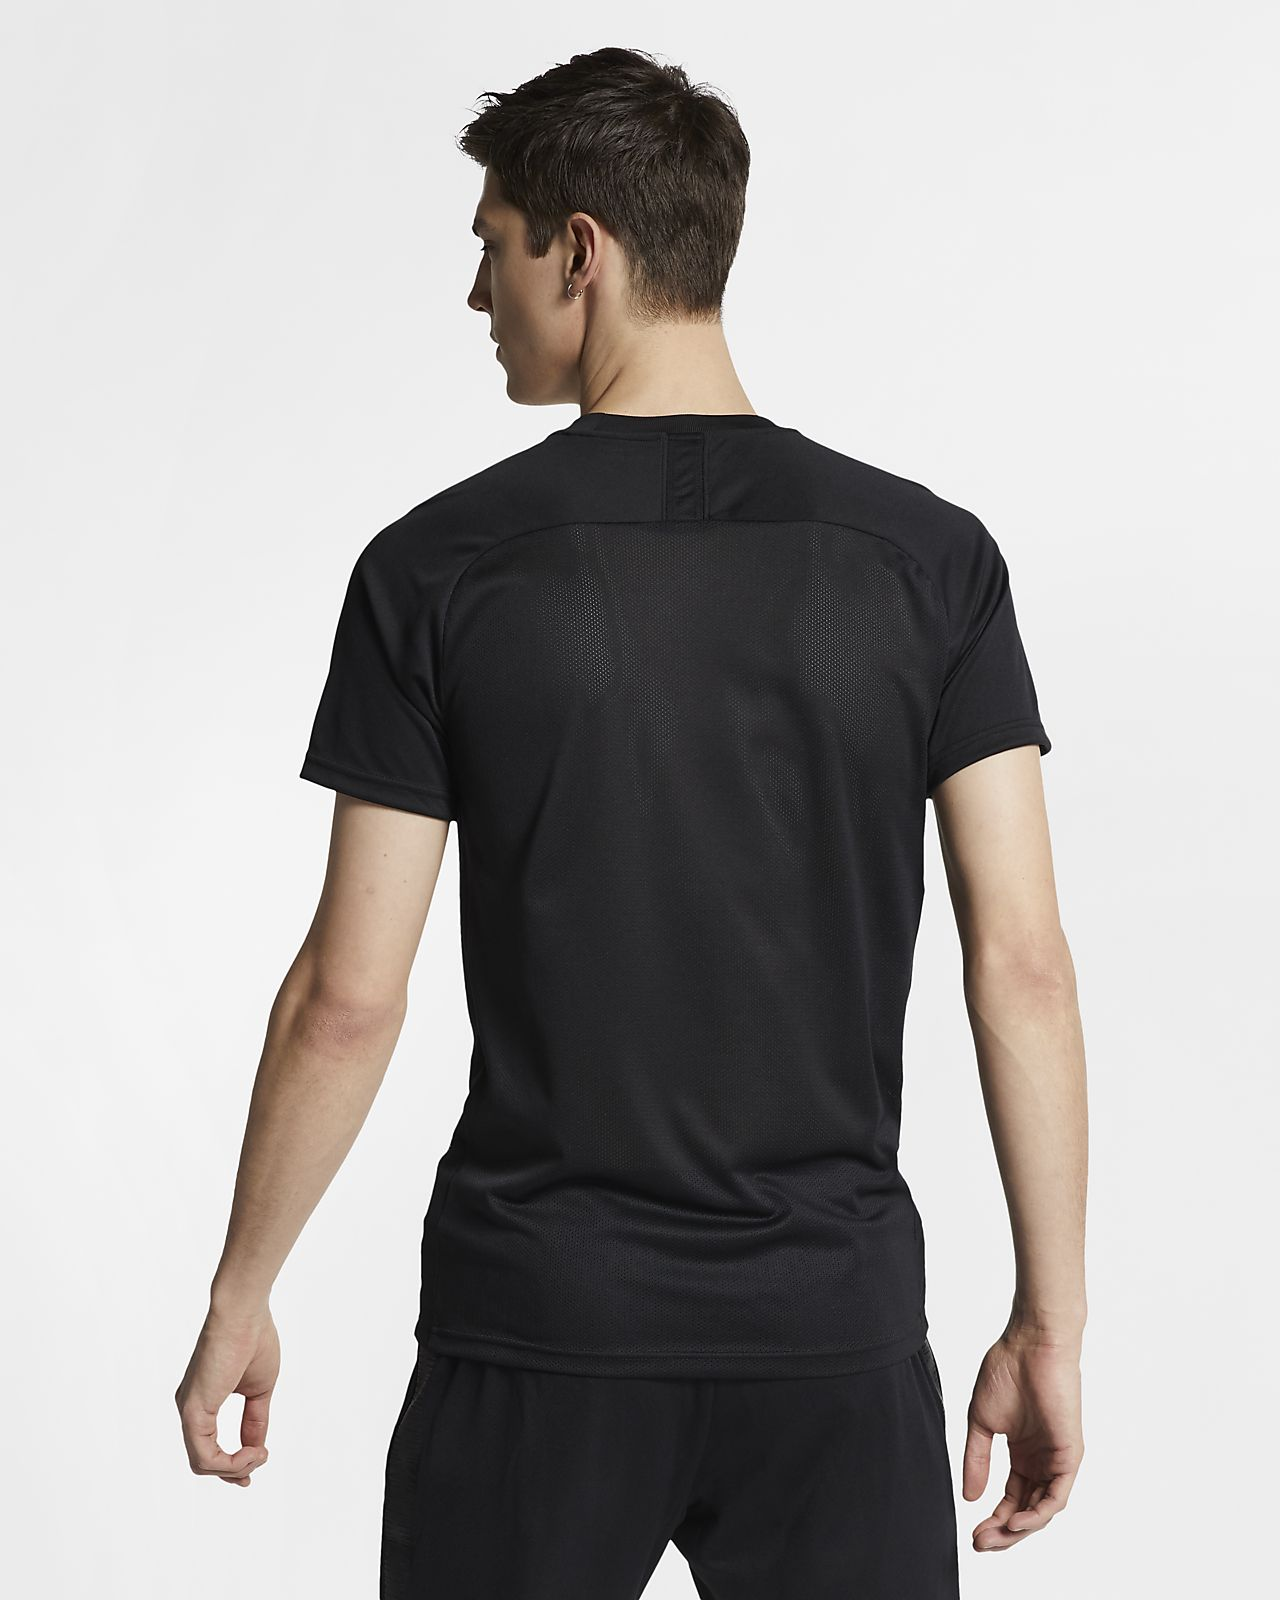 Nike Dri FIT Academy Men's Football Short Sleeve Top